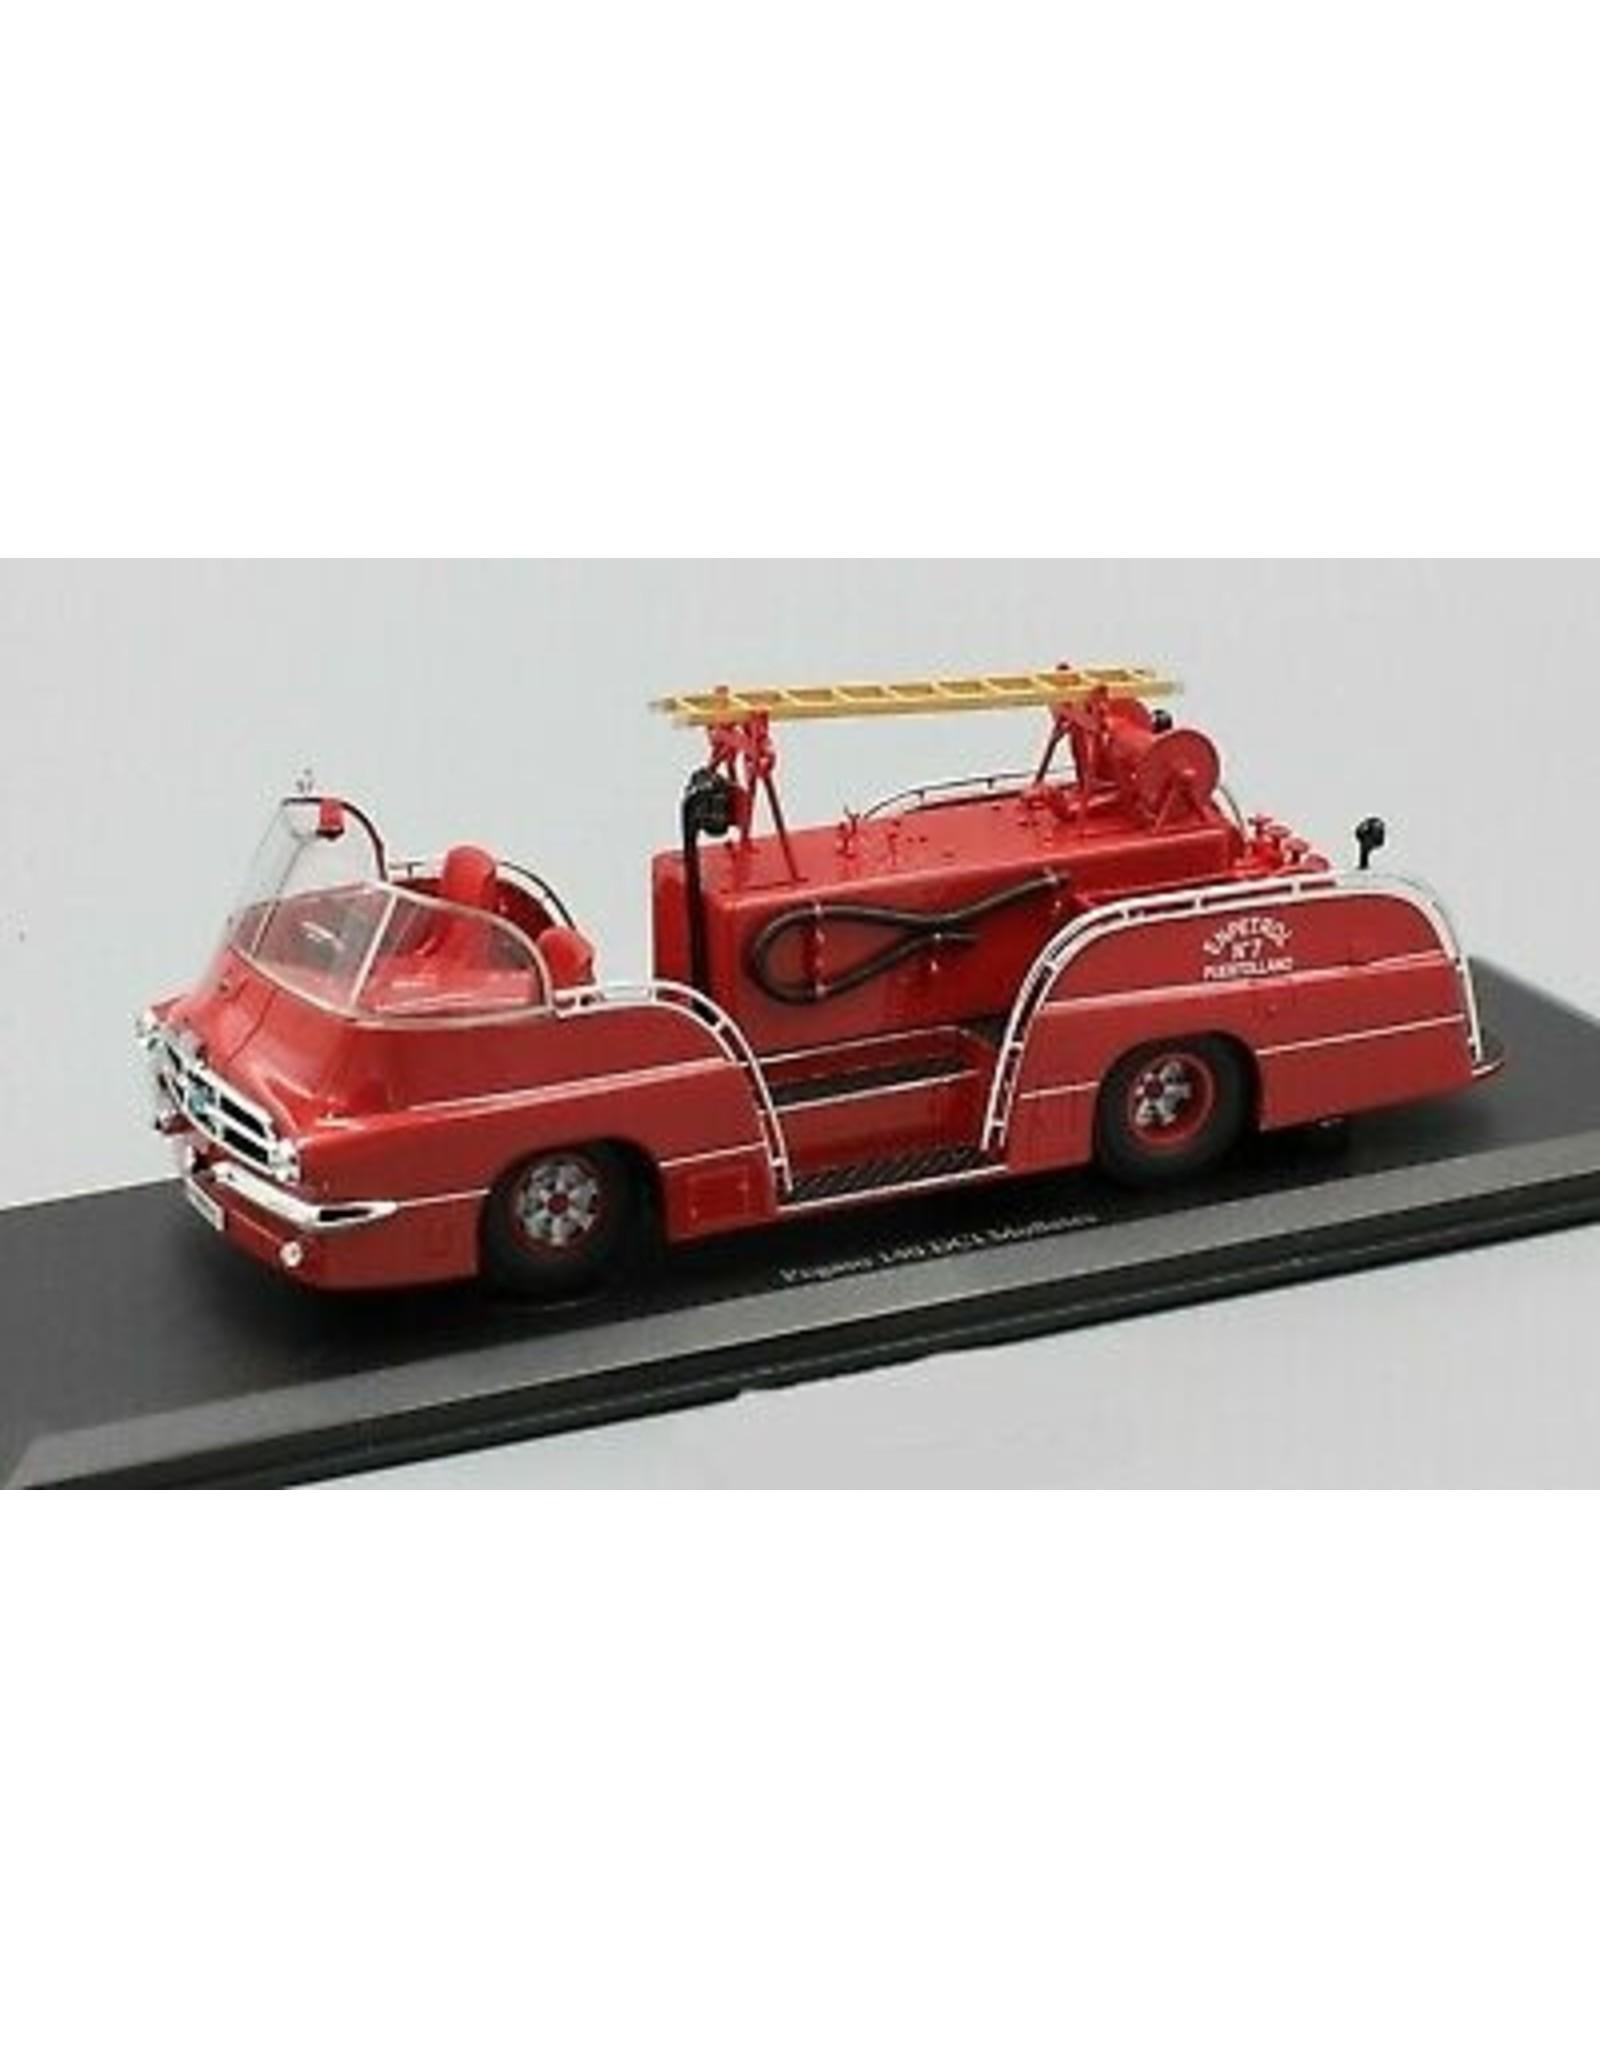 Pegaso Pegaso 140 DCI Mofletes Fire Truck Spain 1959 - 1:43 - Autocult